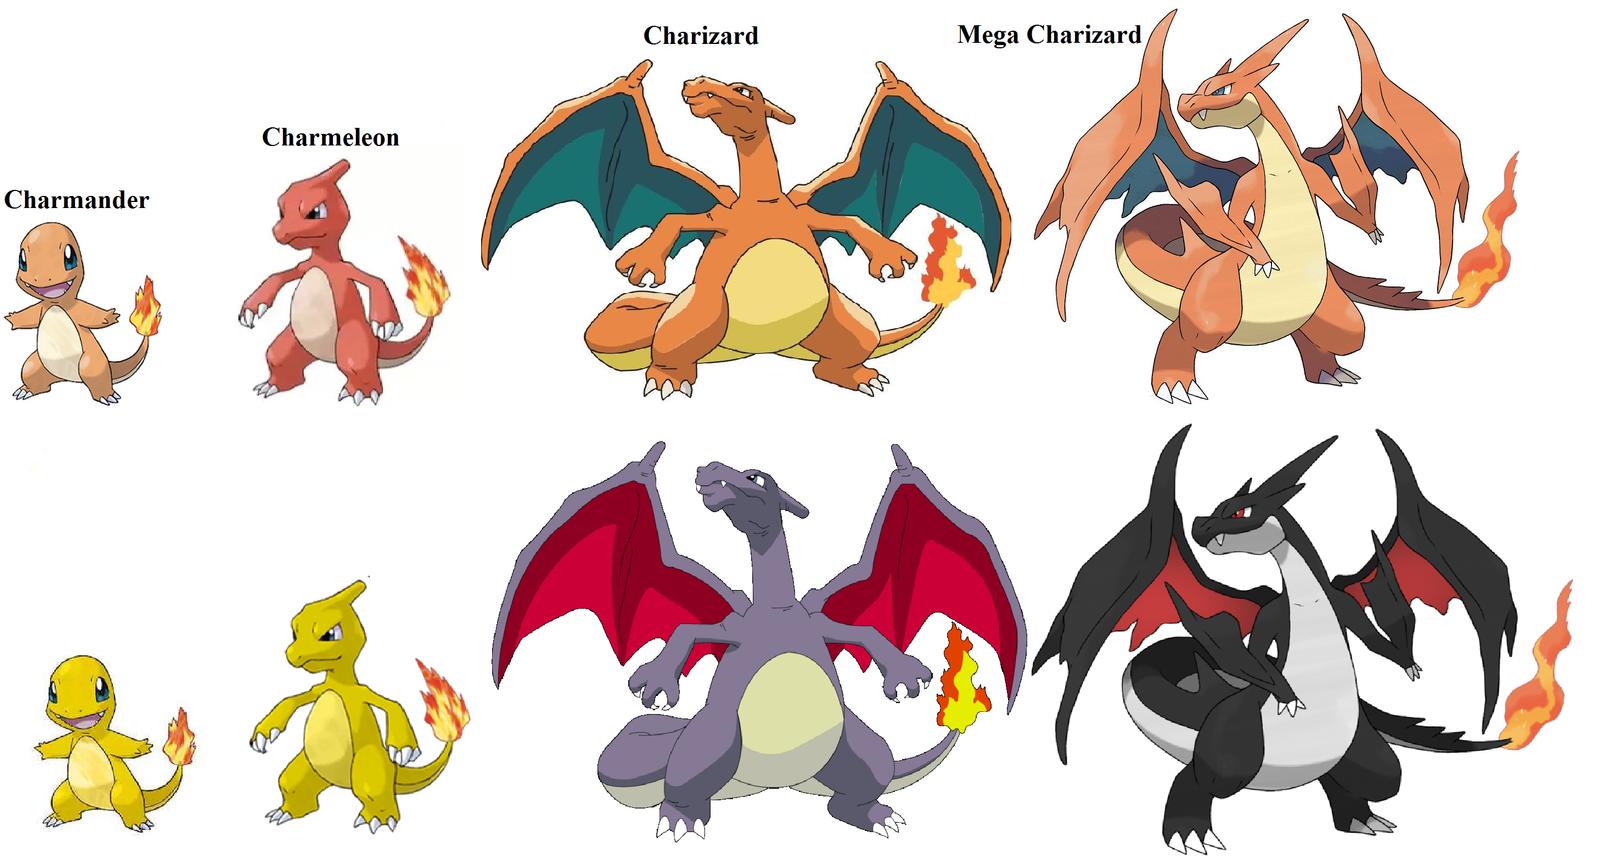 Charizard evolutions by skilarbabcock on deviantart - Pokemon xy mega evolution chart ...